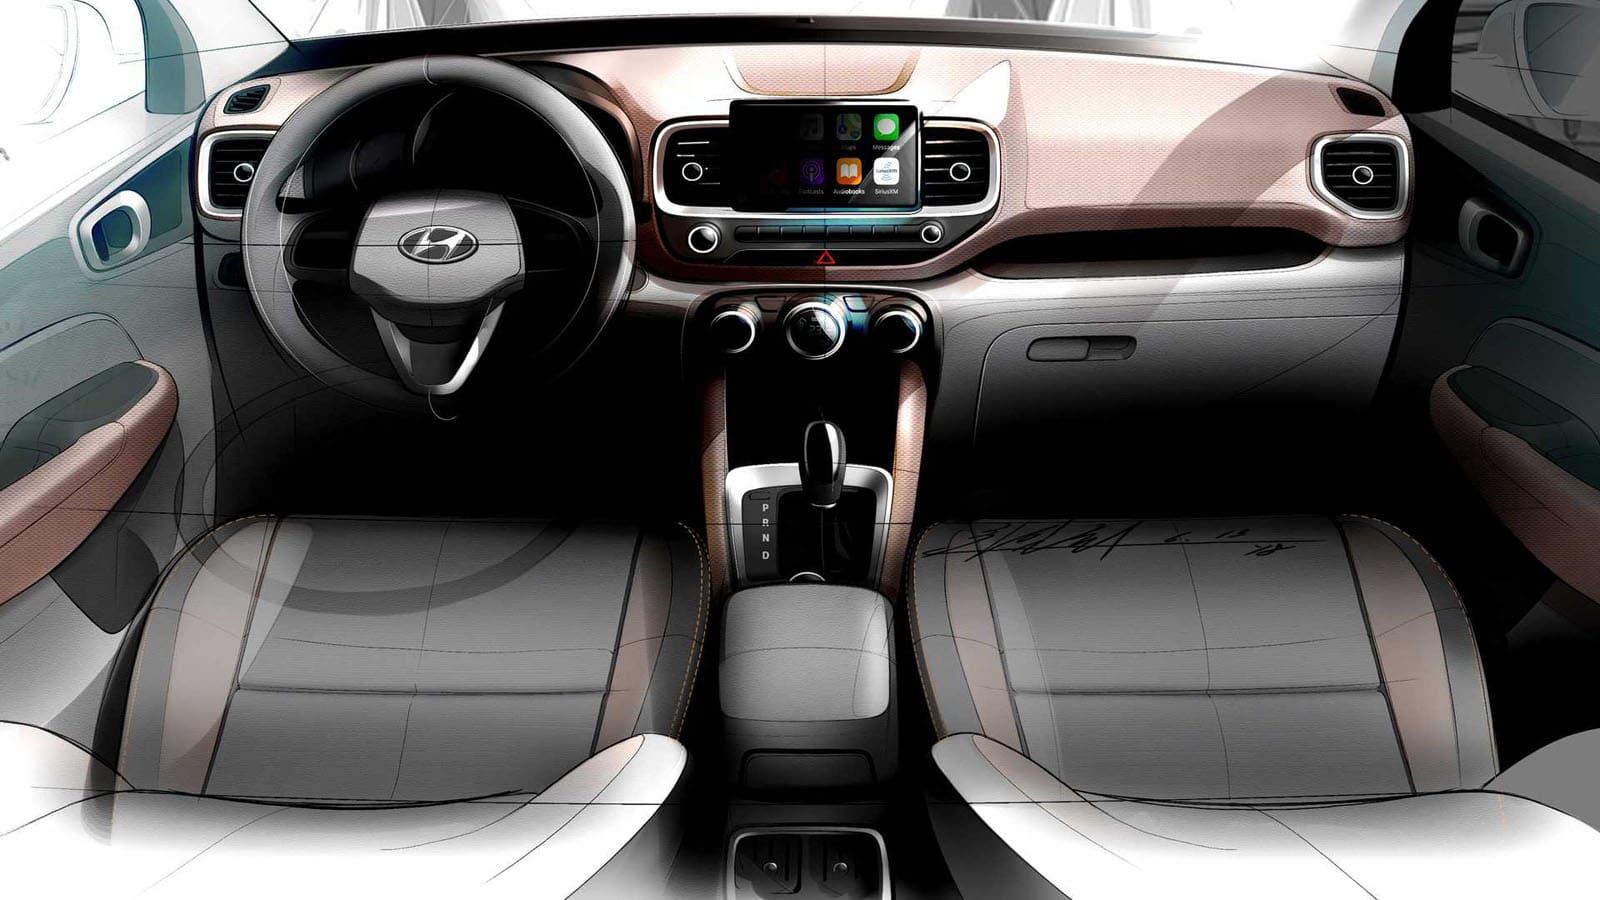 2020 Hyundai Venue Teaser Image Interior